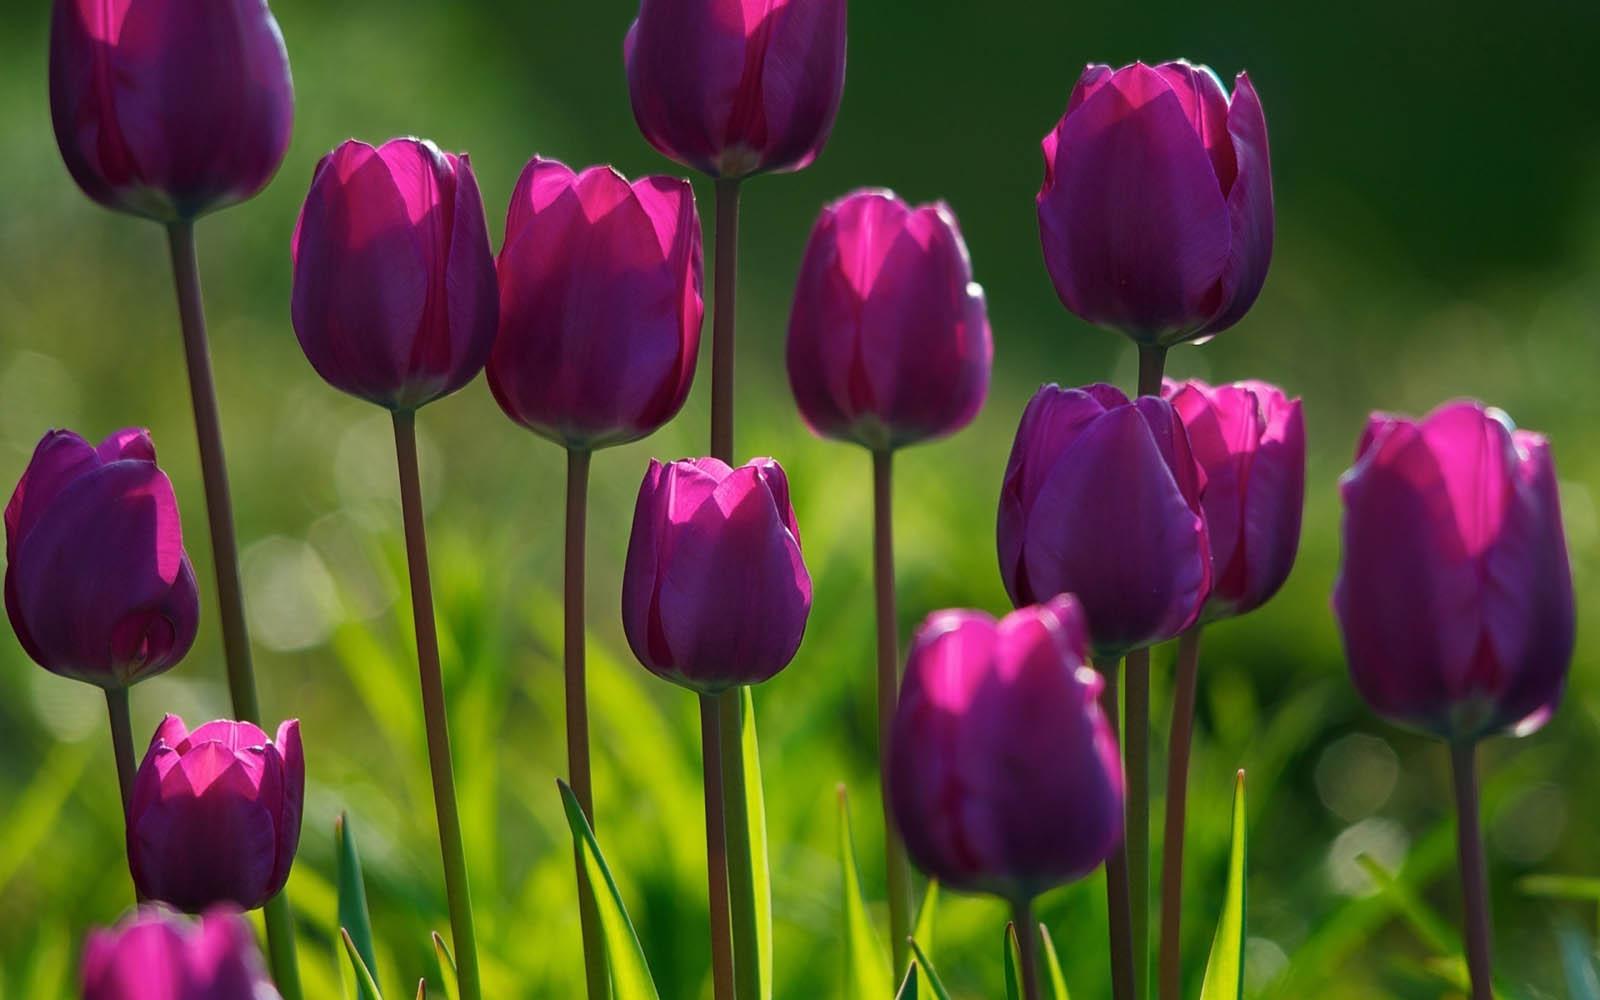 Flowers Desktop Wallpapers Purple Tulips Flowers Desktop Backgrounds 1600x1000